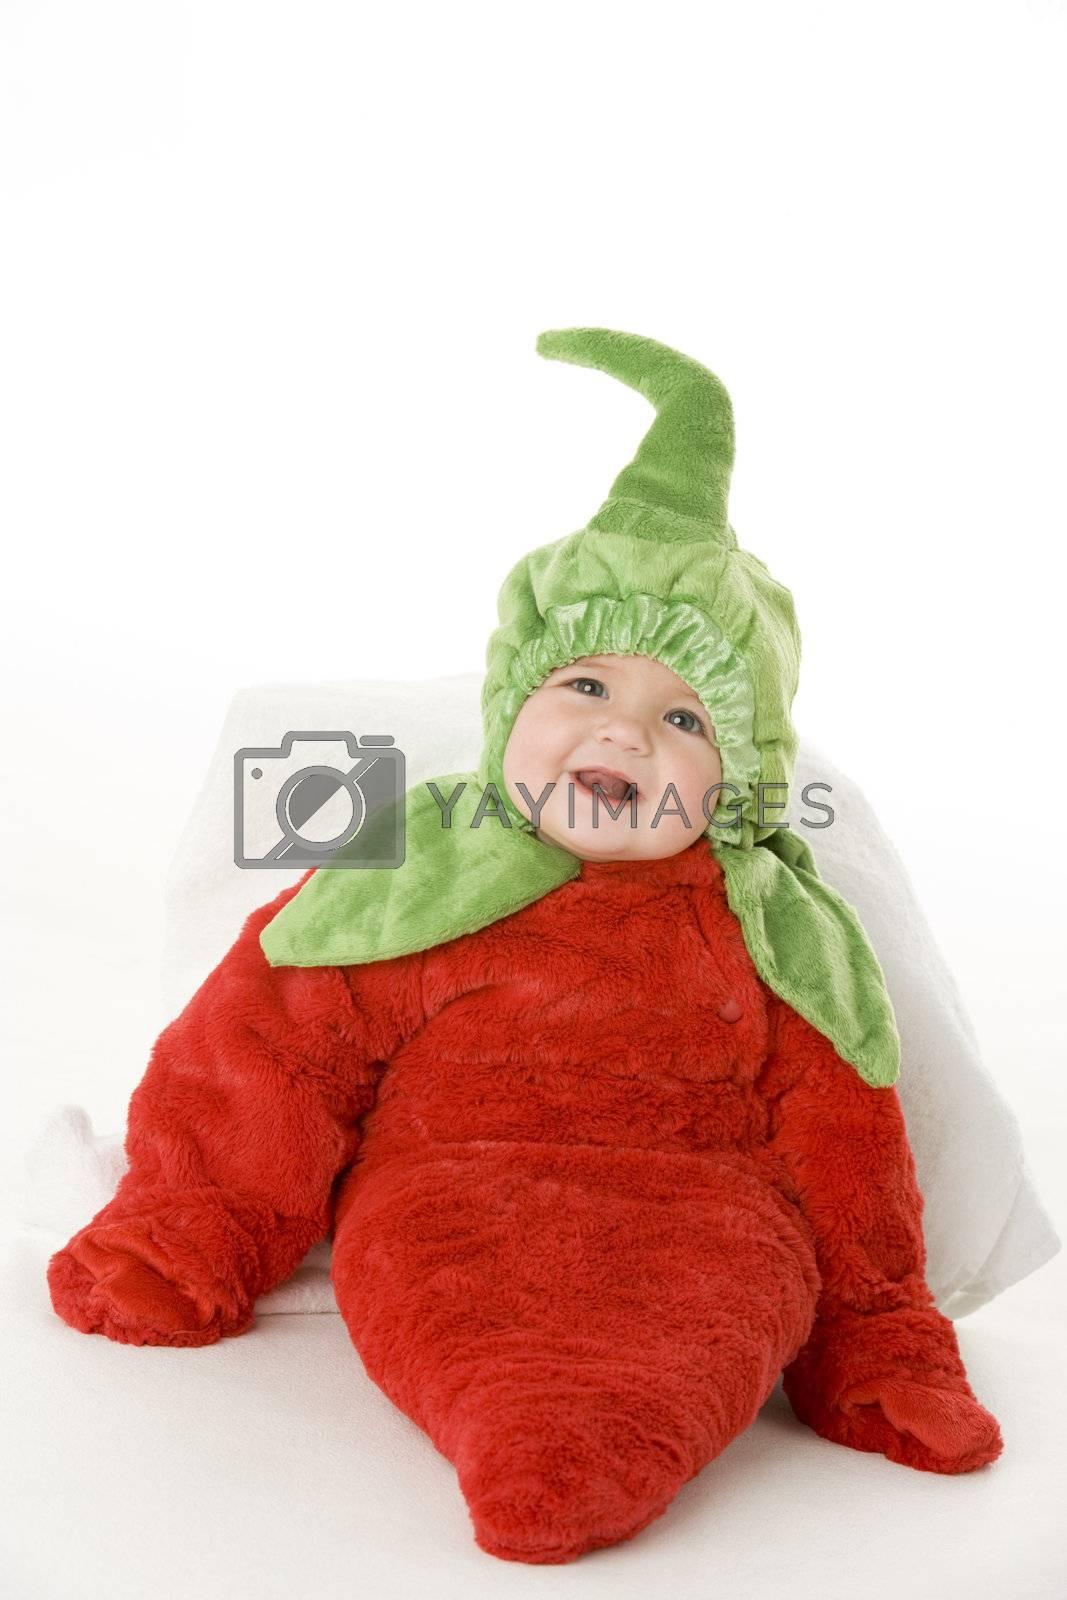 Baby in pepper costume